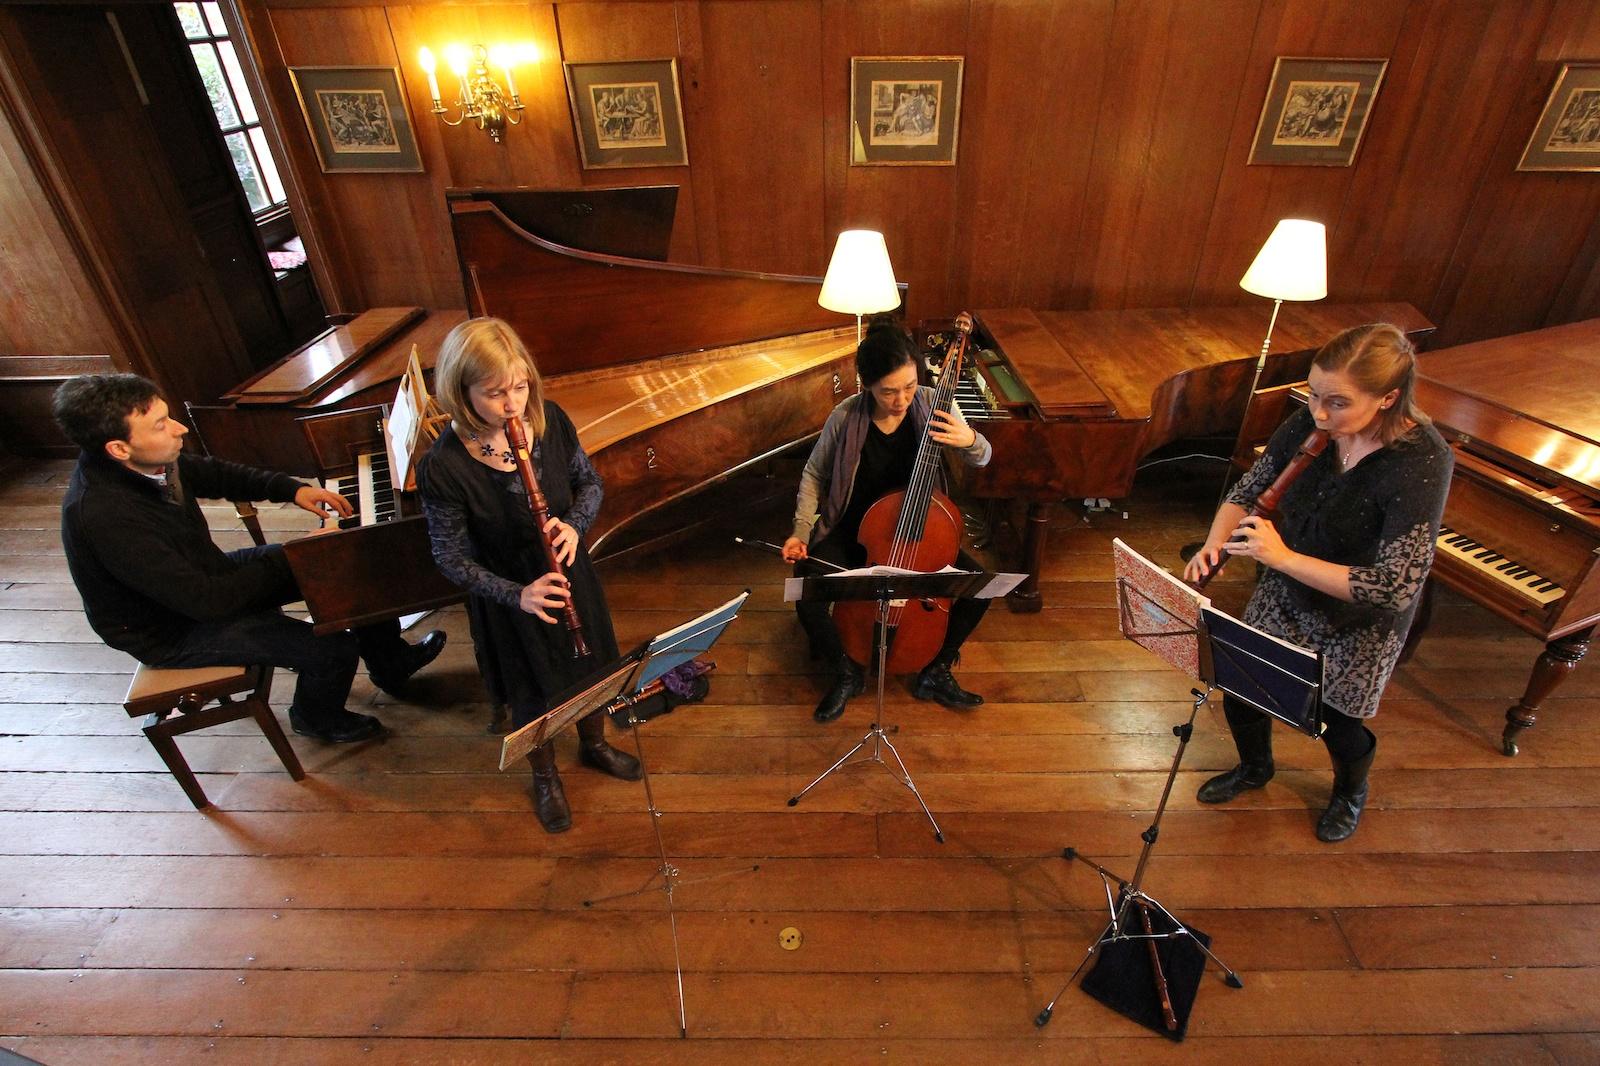 Passacaglia quartet with two recorders